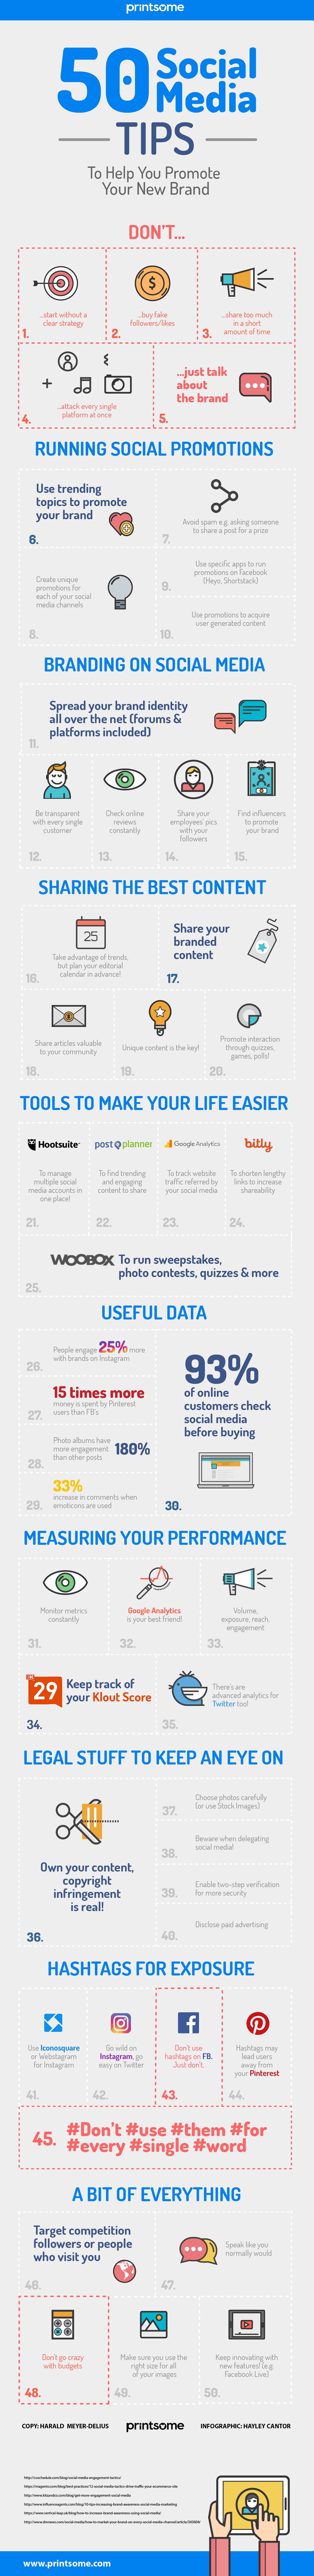 infographic 50 social media tips